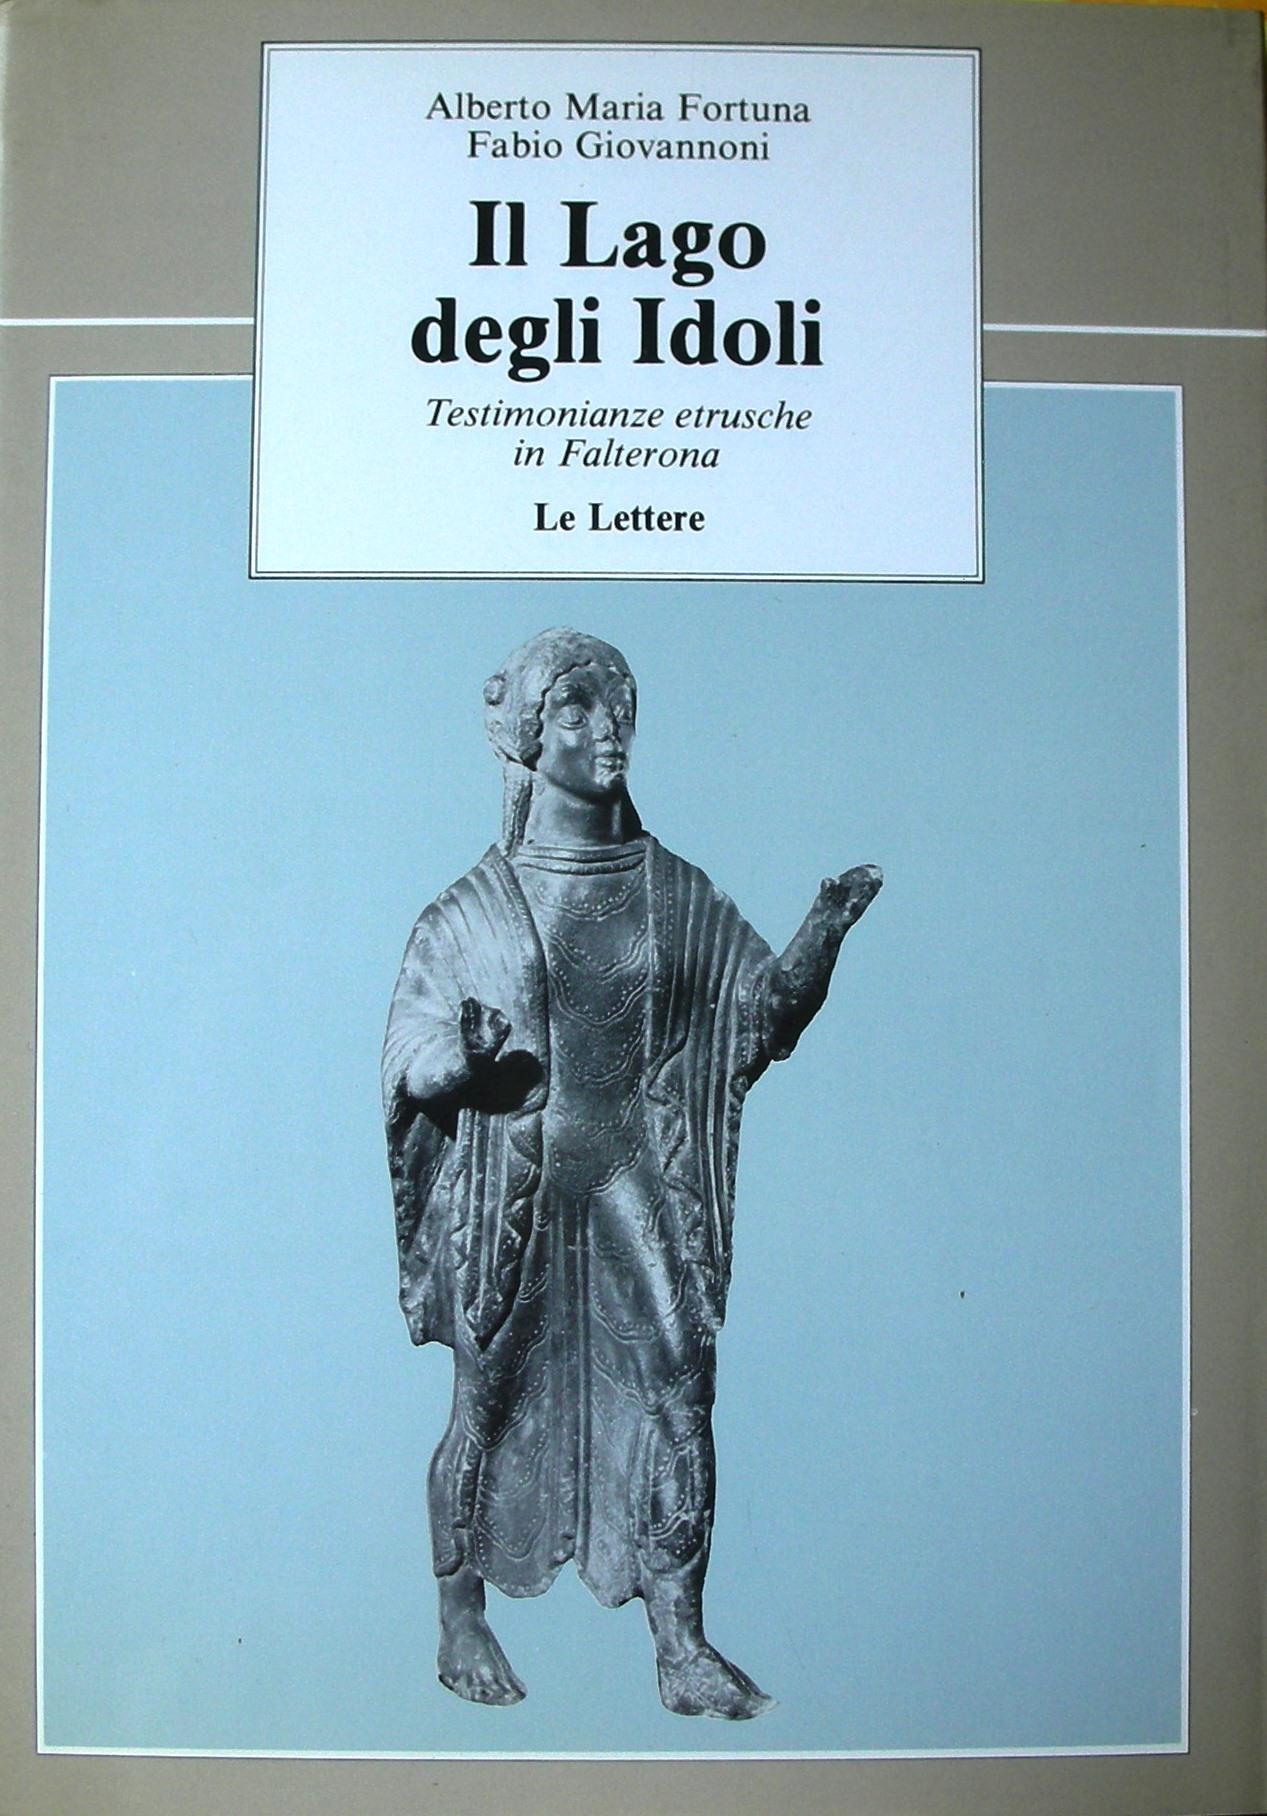 Il lago degli idoli